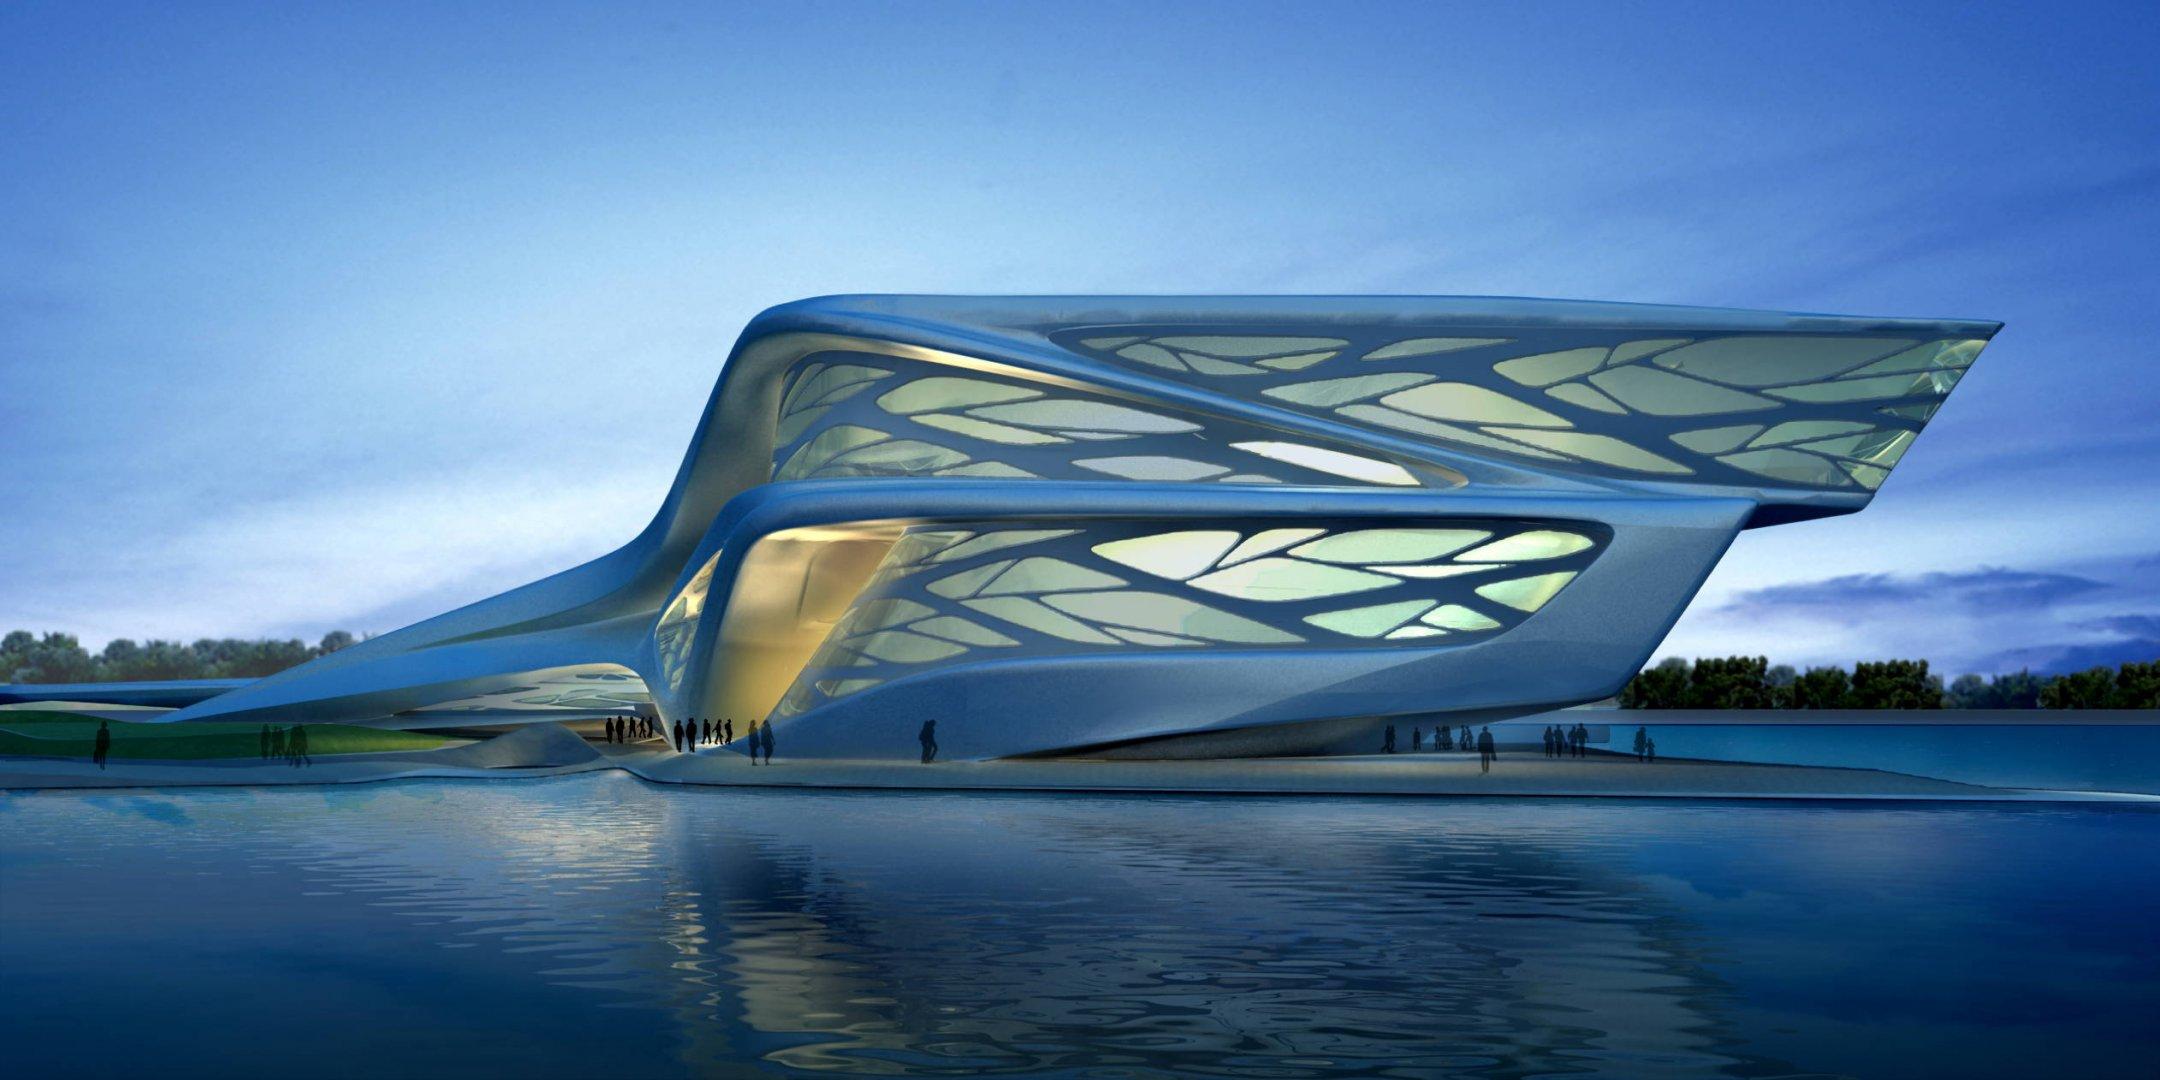 Центр искусств в Абу-Даби, ОАЭ